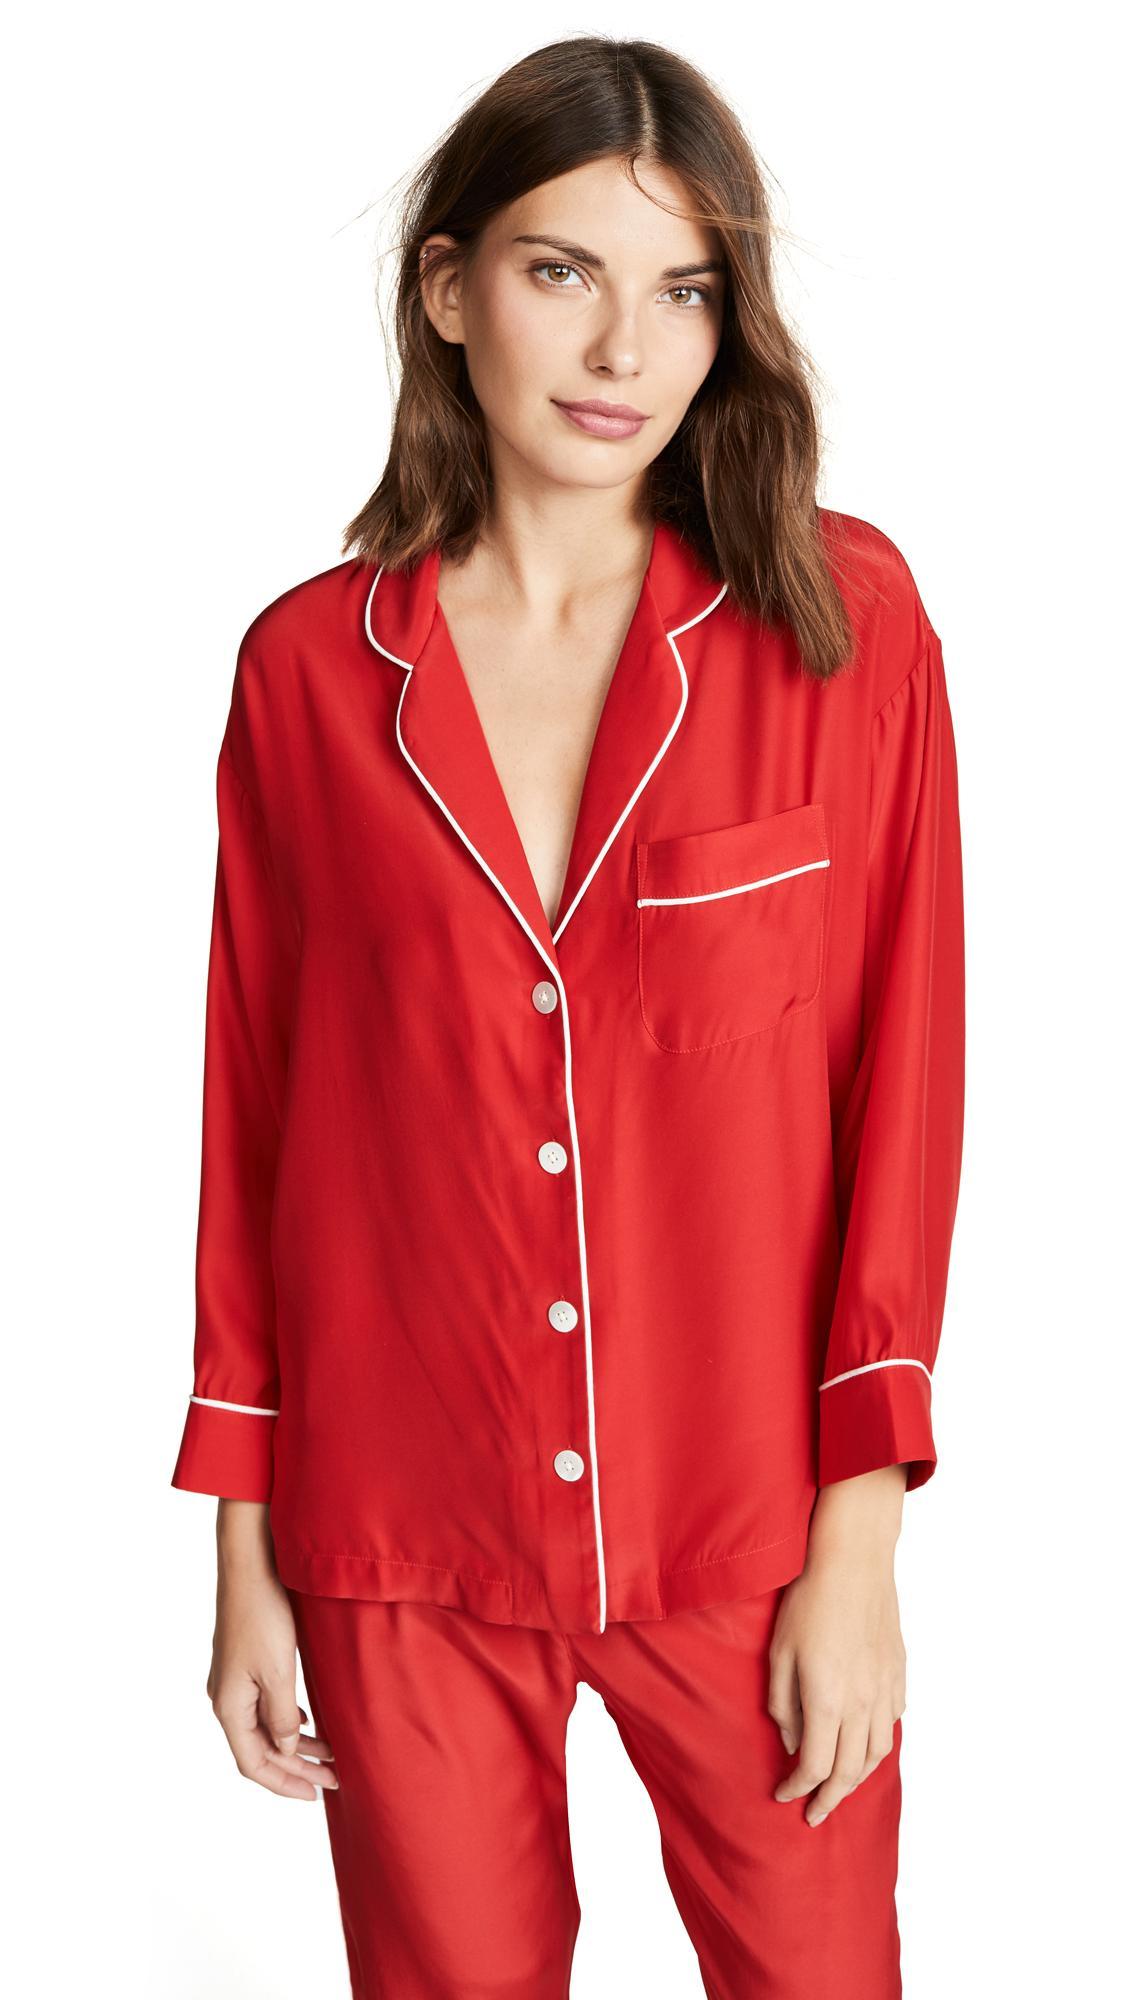 Sleepy Jones Marina Pajama Shirt In Silk Charmeuse Red